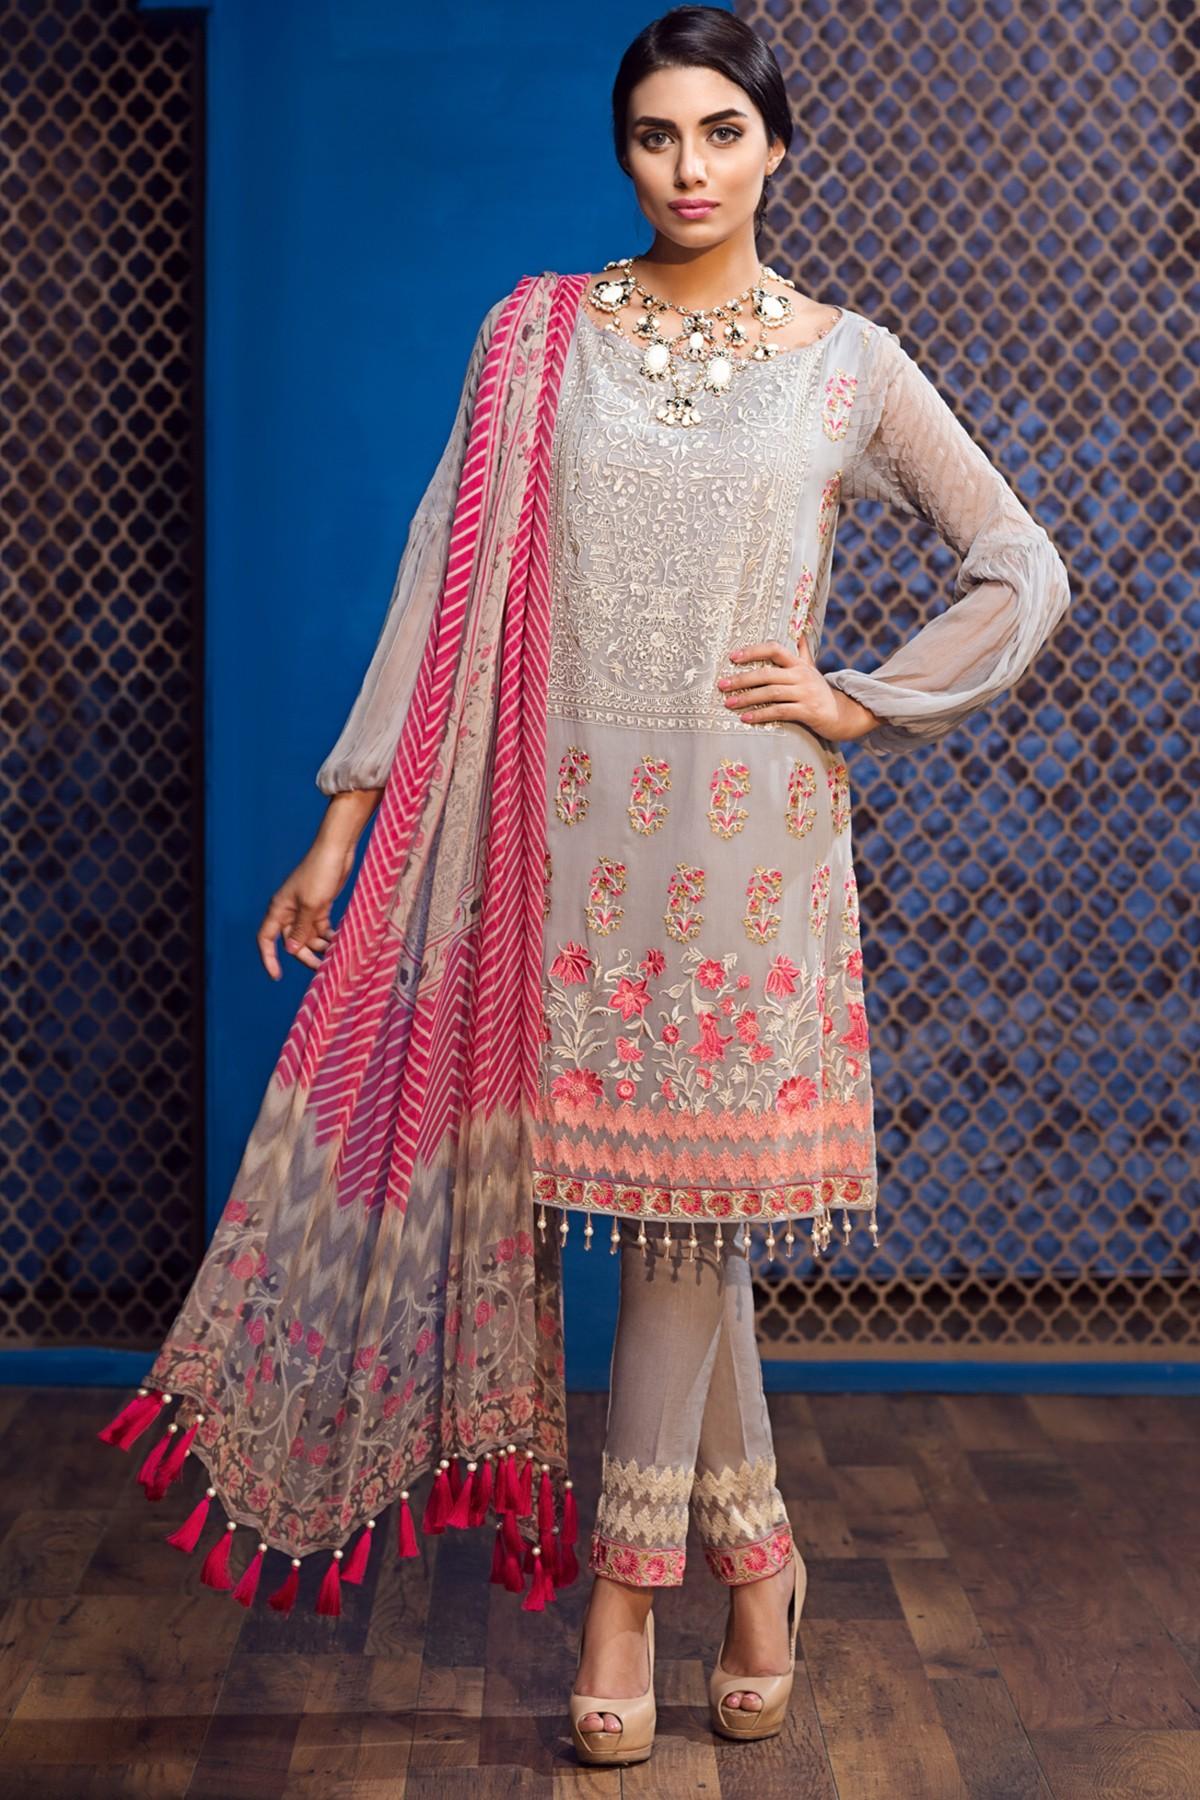 Khaadi Lawn Chiffon Eid Dresses Designs Collection 2017-2018 (19)